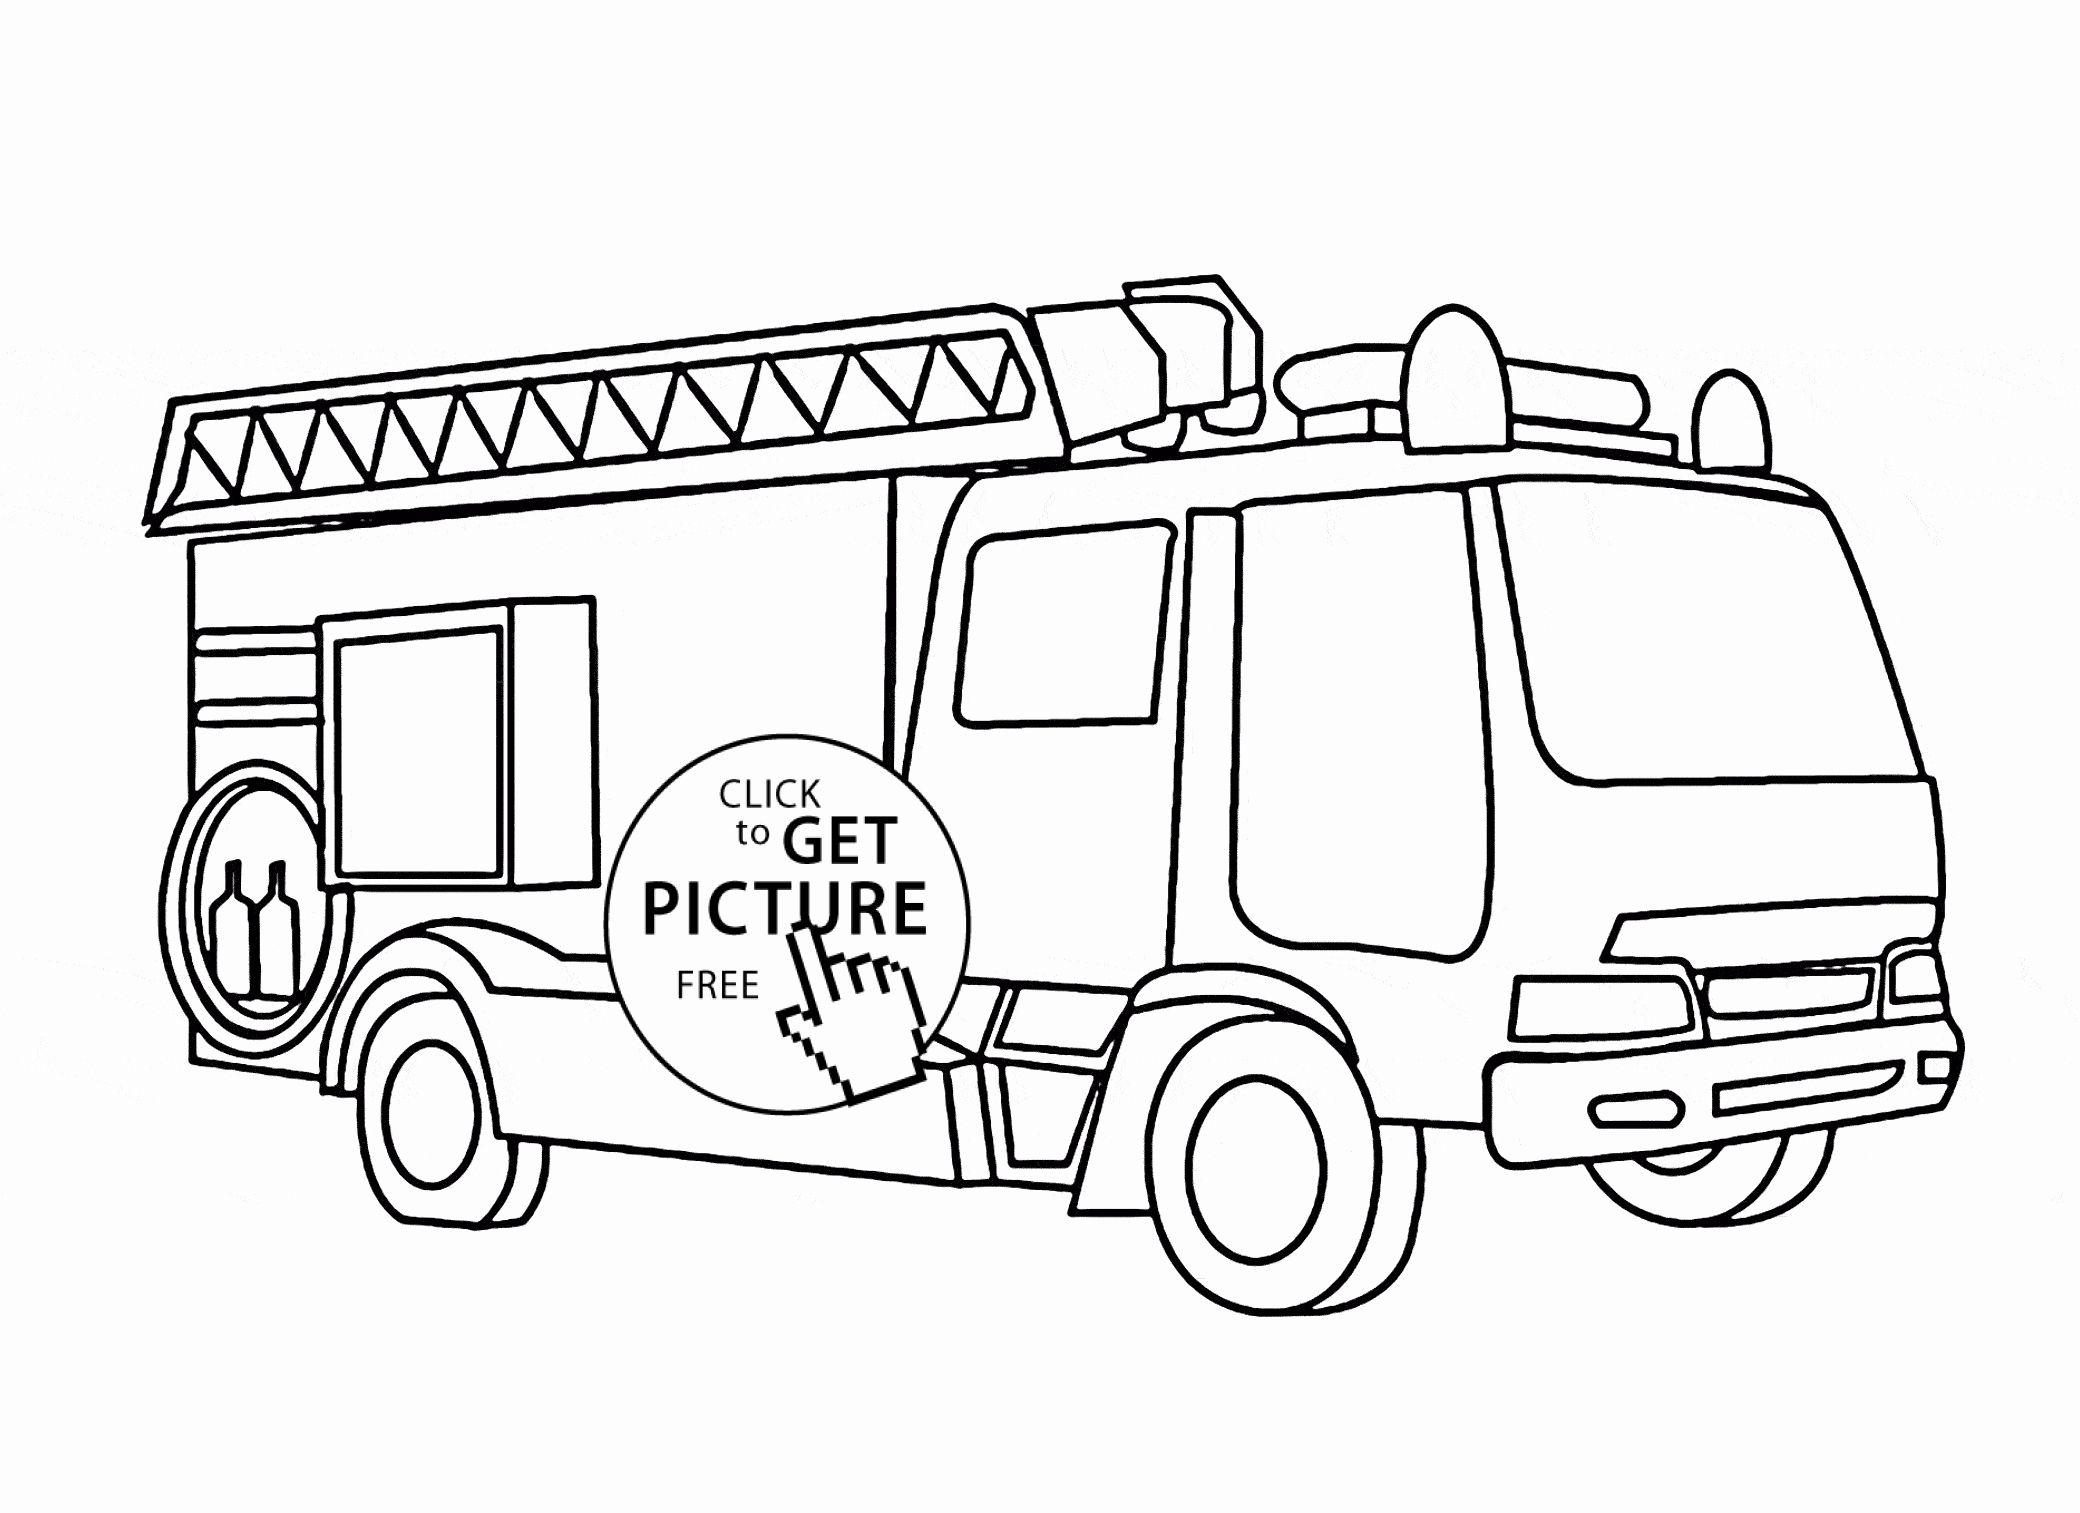 Coloring Page Fire Truck Unique Simple Fire Truck Drawing At Getdrawings Truck Coloring Pages Fire Truck Drawing Fire Trucks